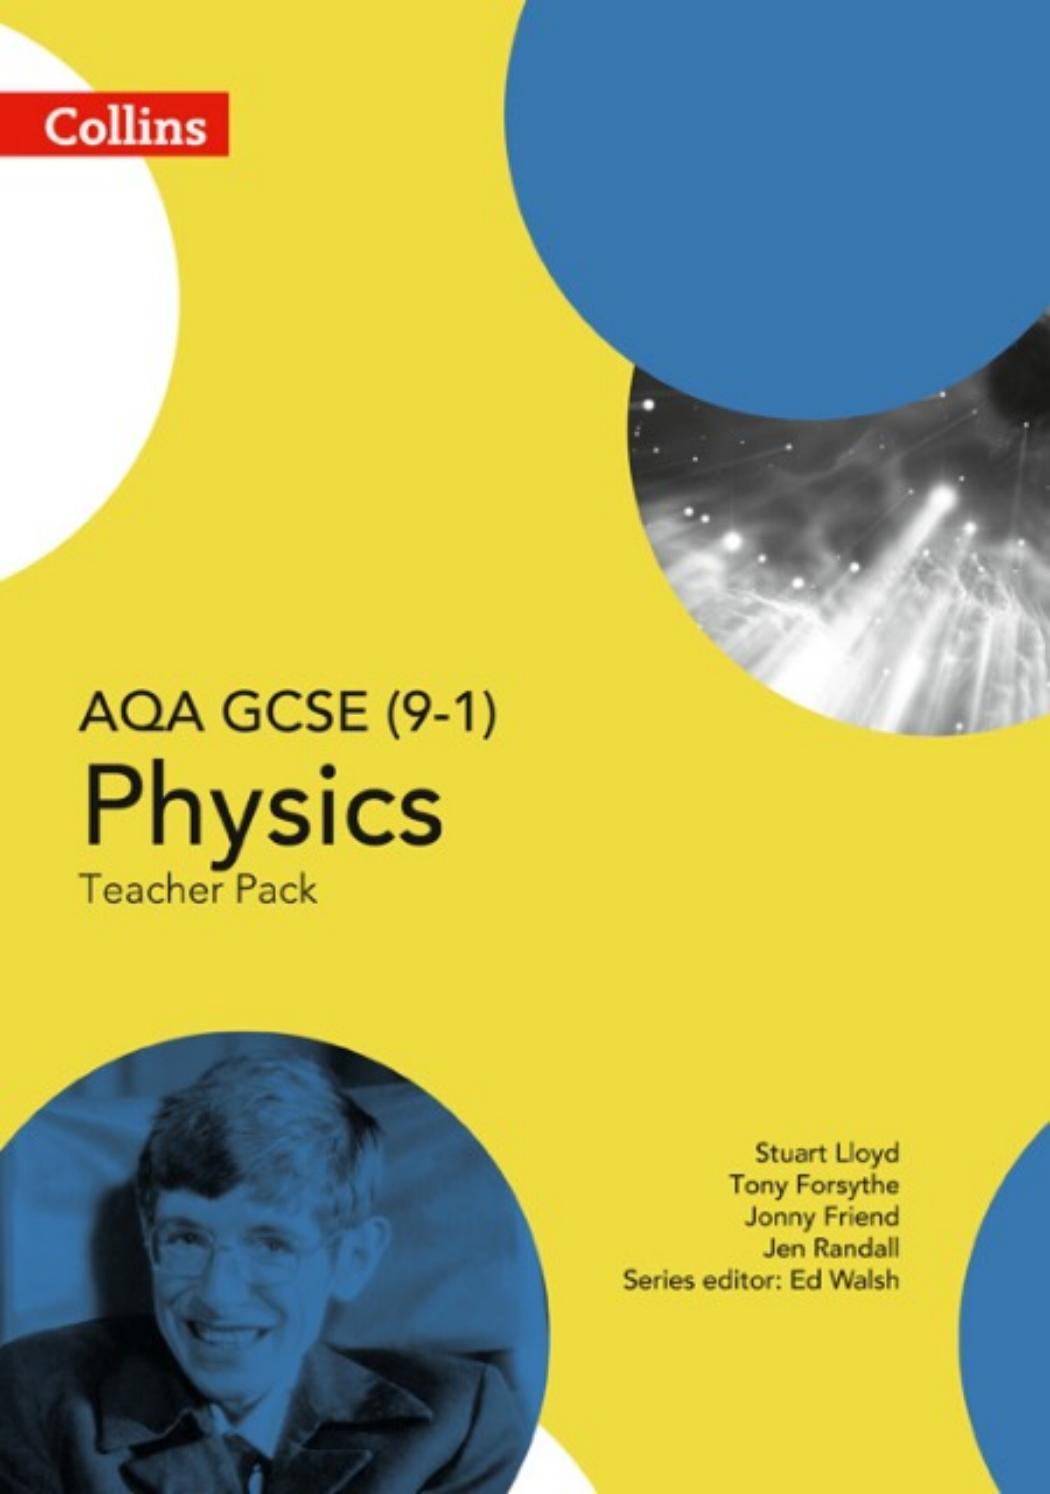 ocr physics coursework 2013